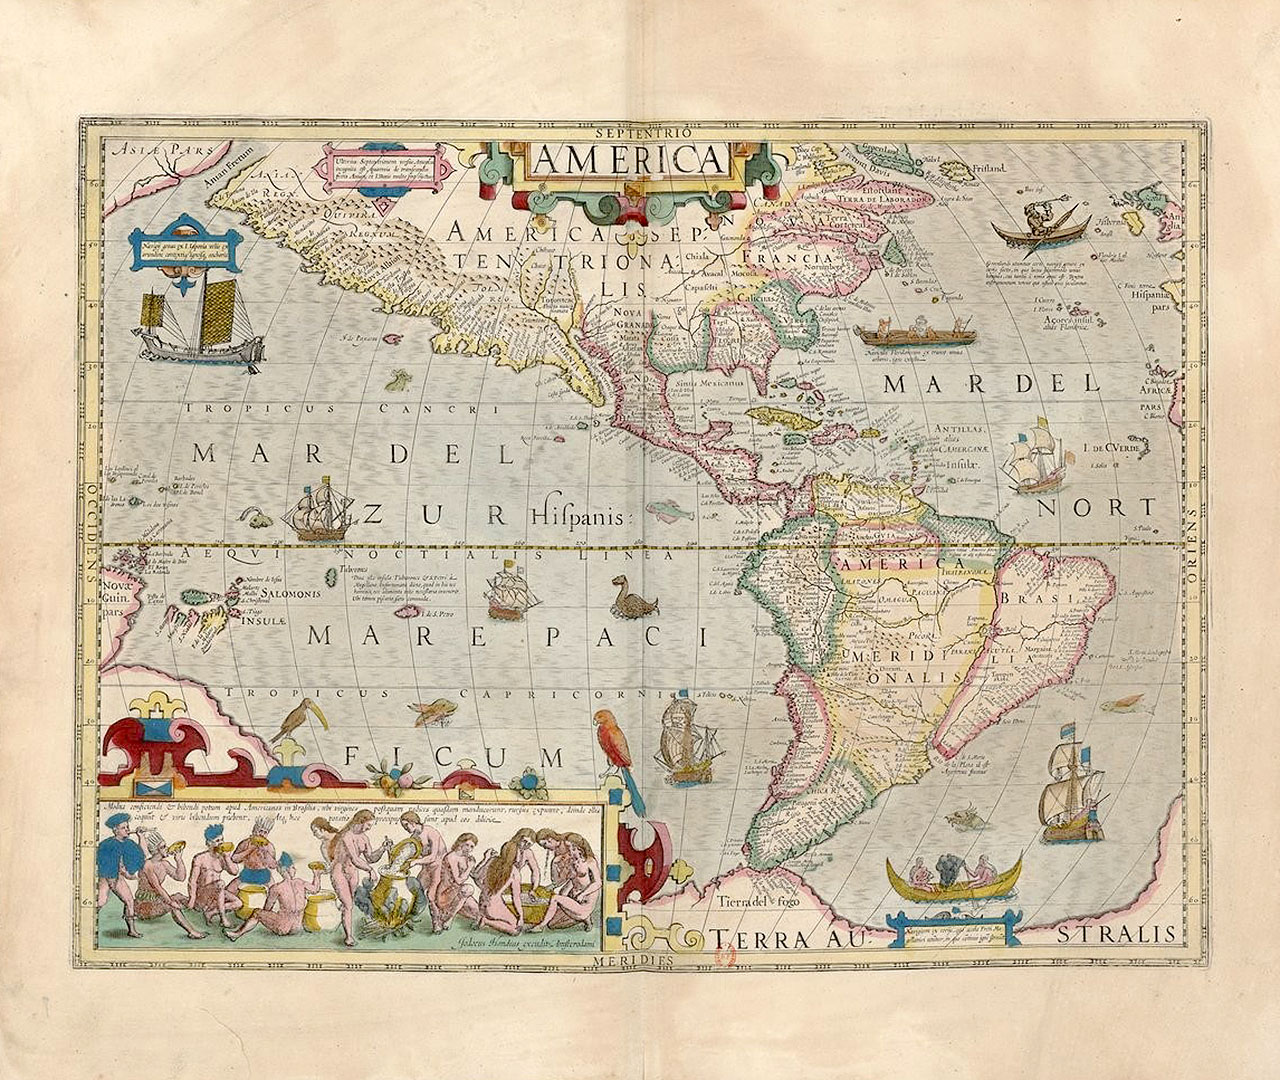 America. S.l.: M.Mercator, 1595